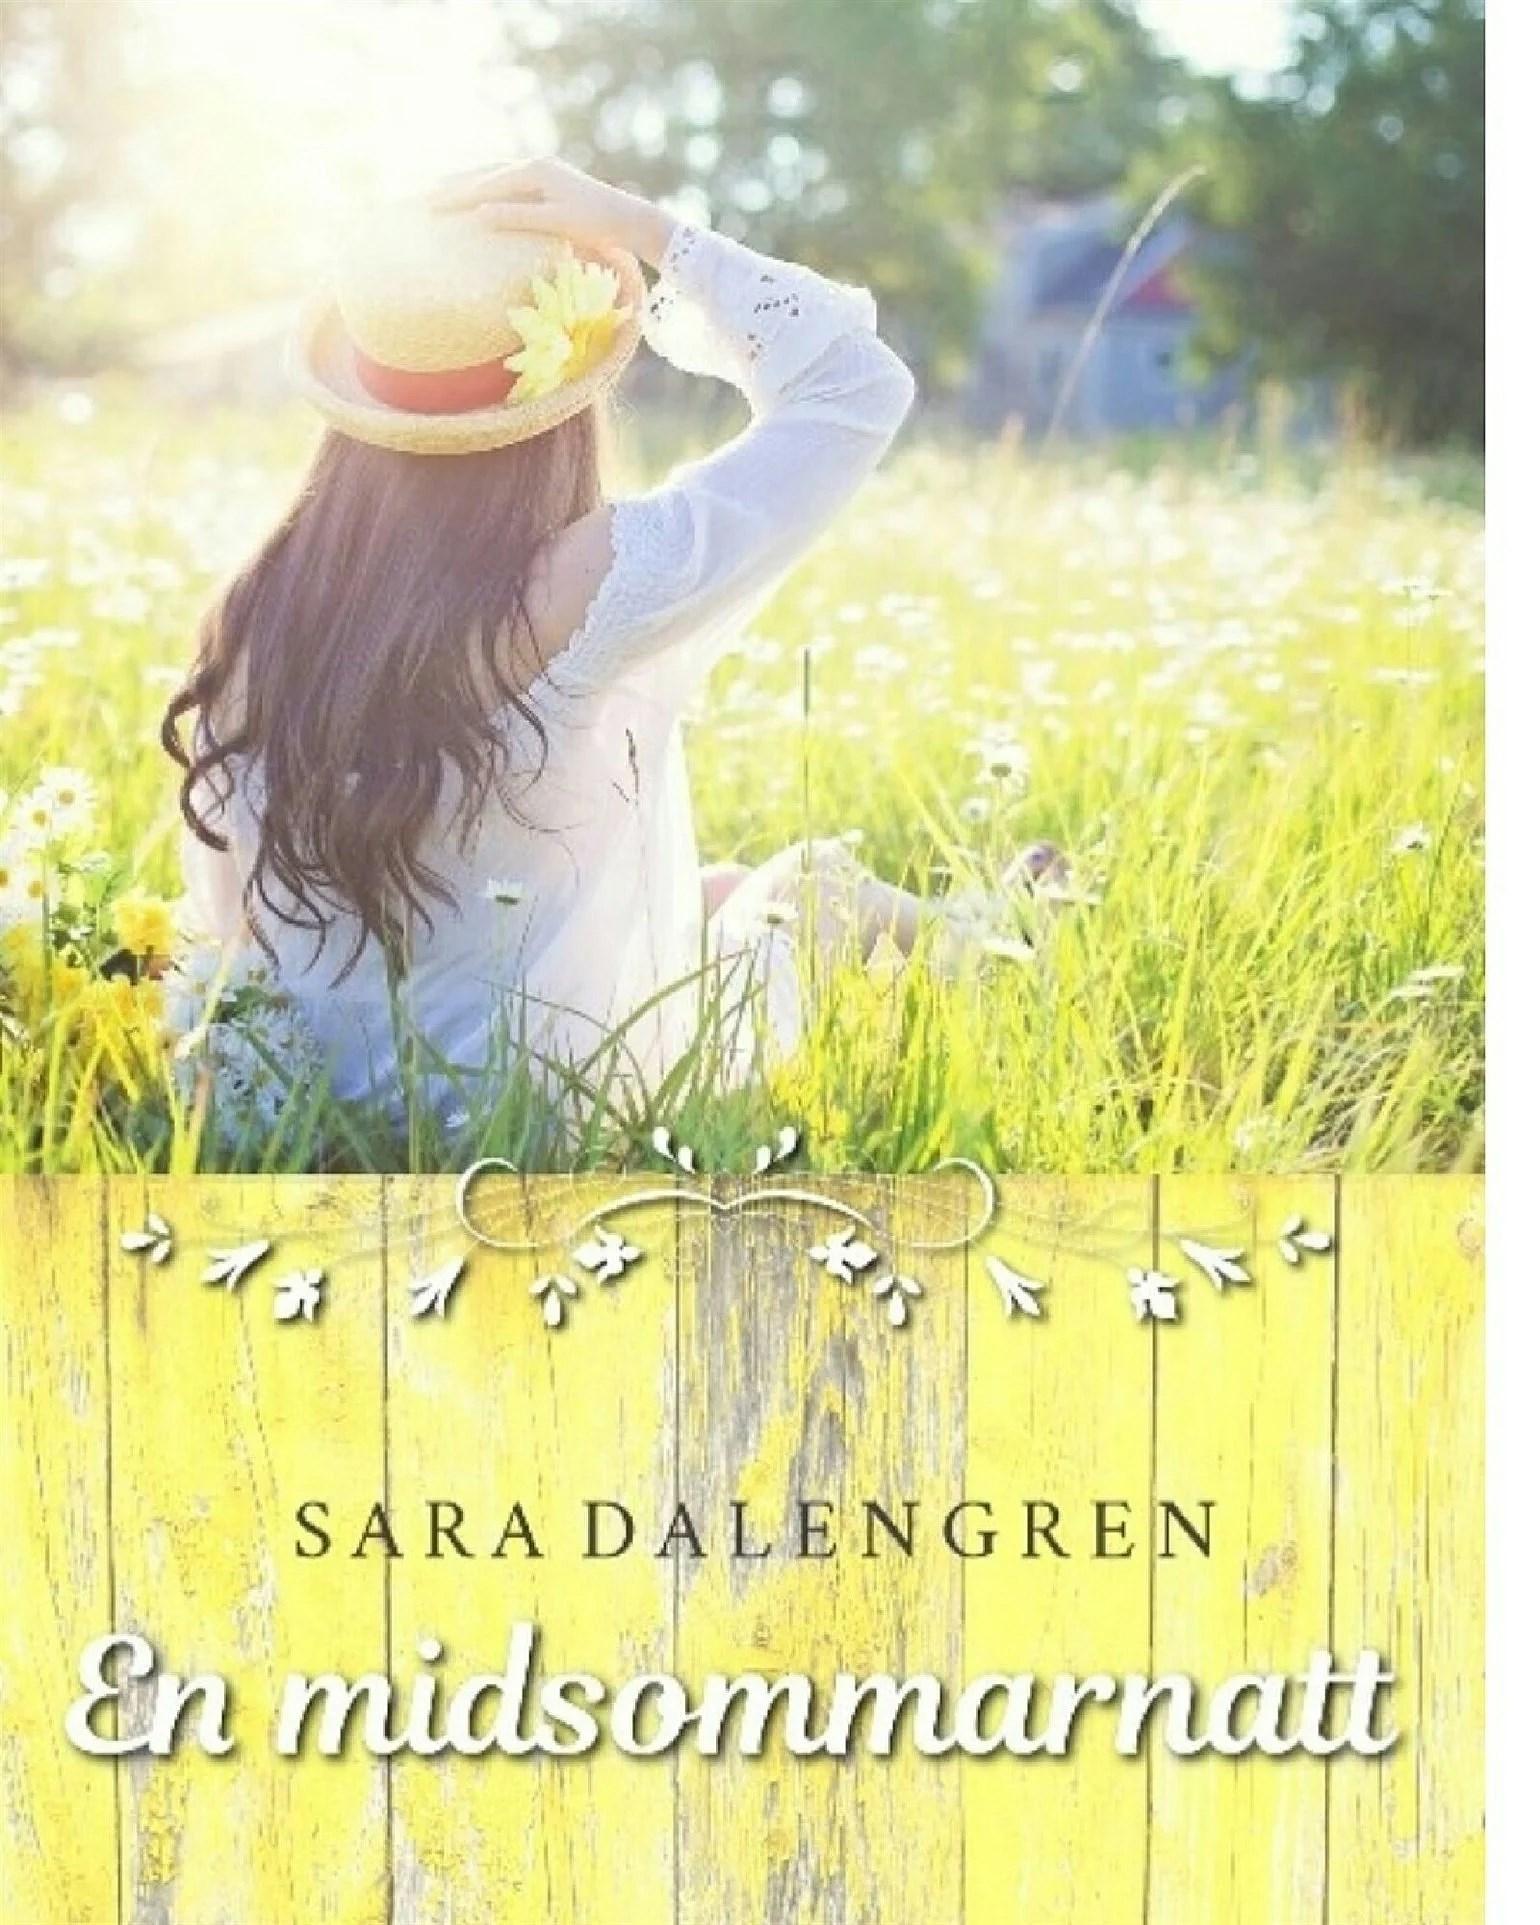 En midsommarnatt -Sara Dalengren